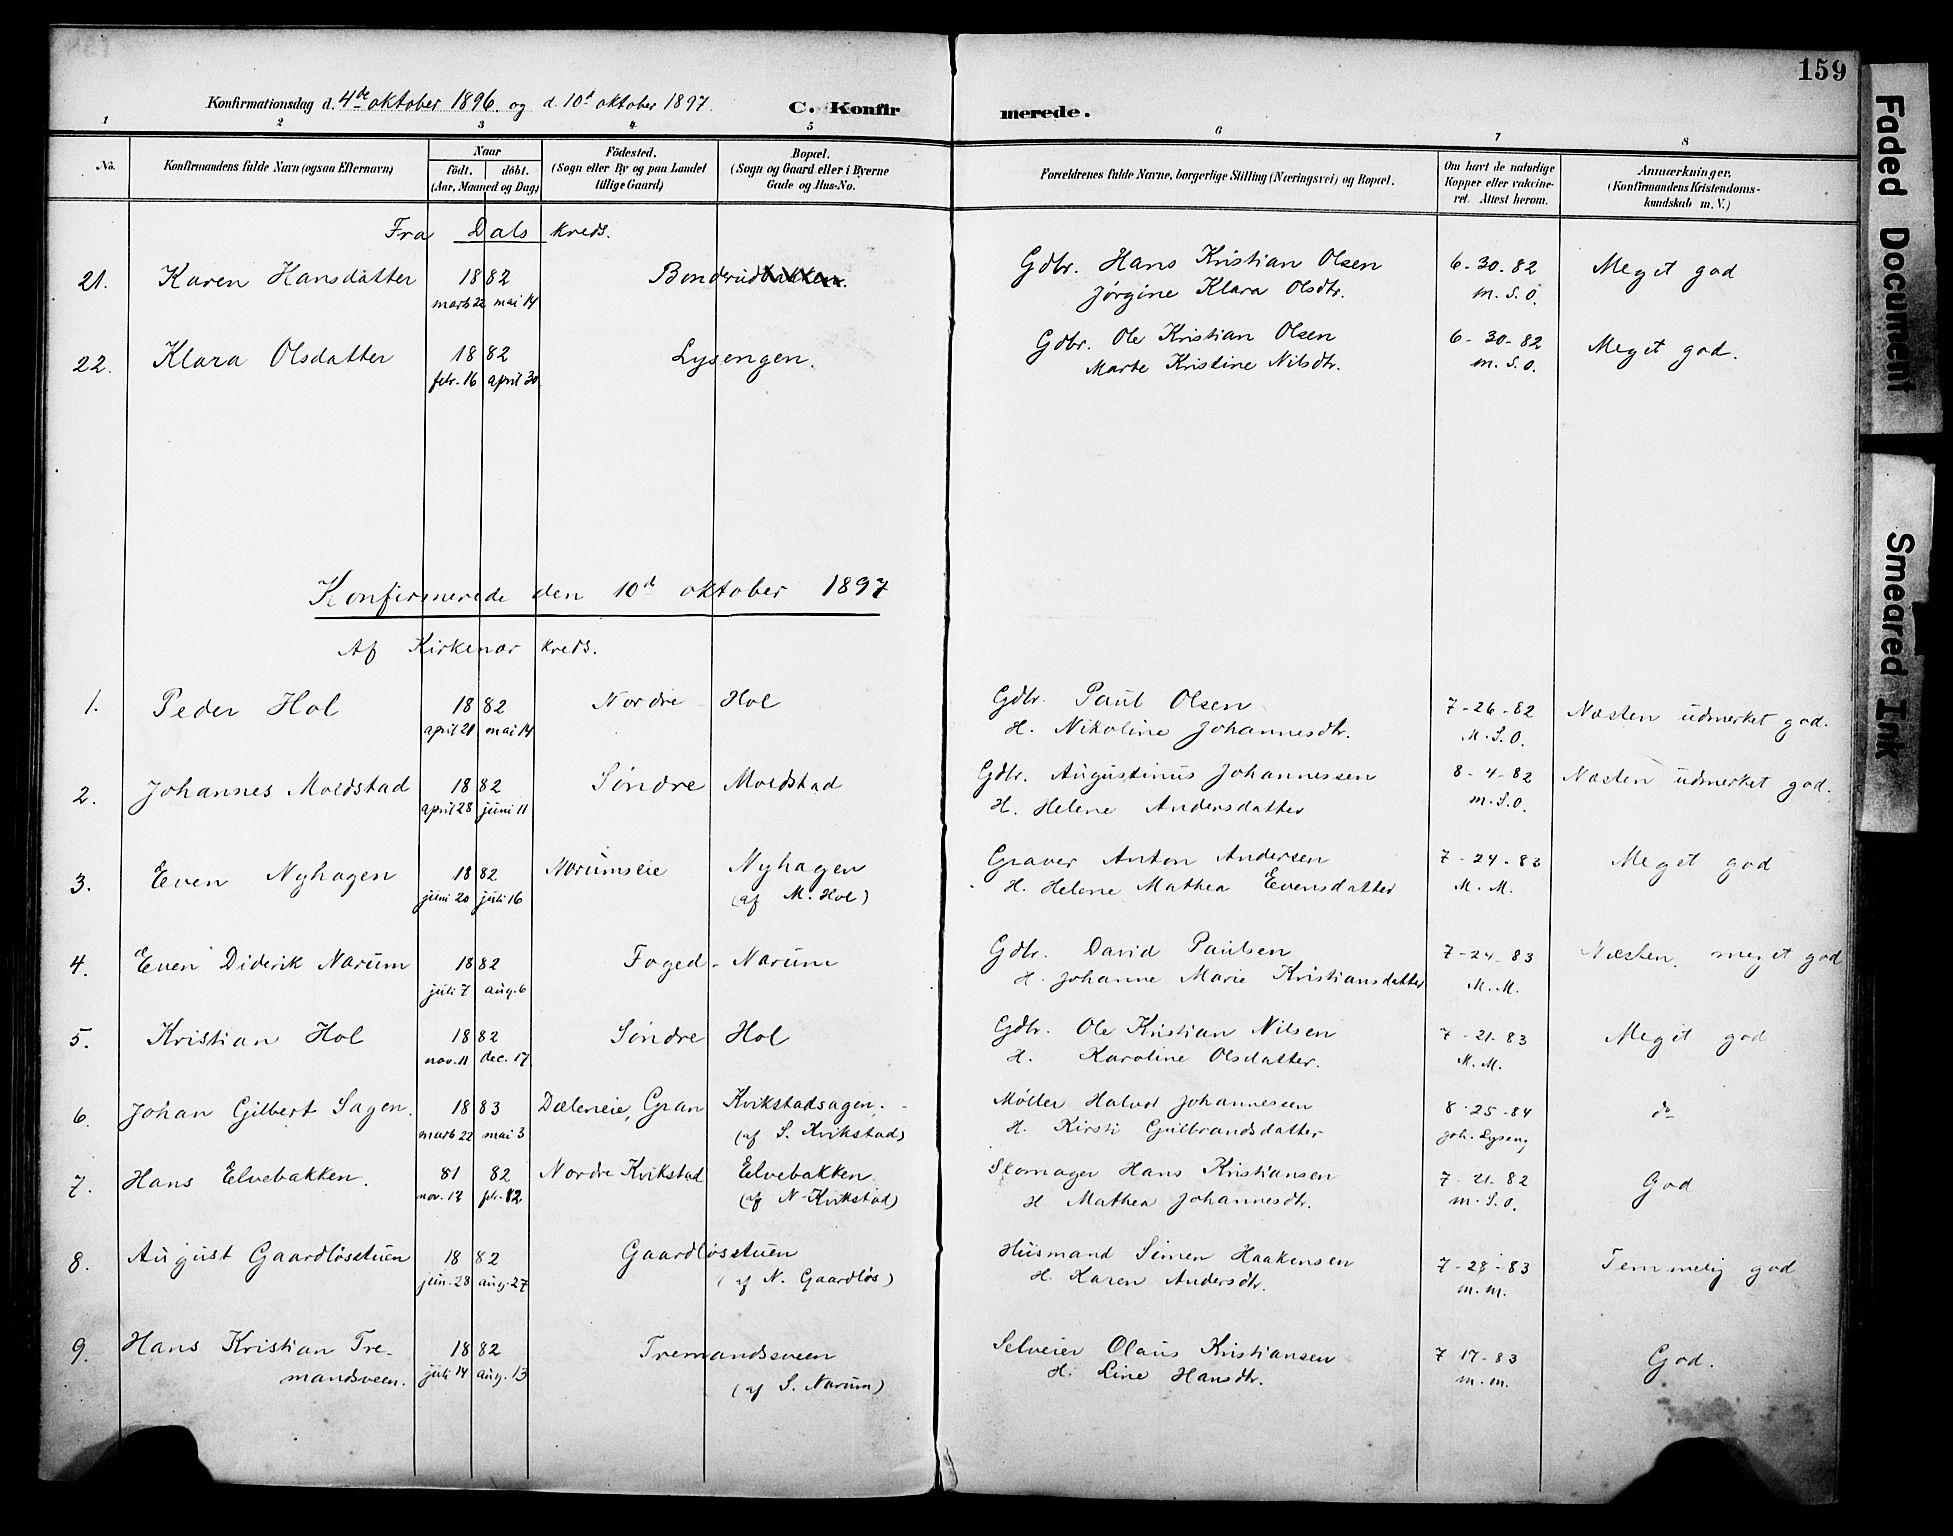 SAH, Vestre Toten prestekontor, H/Ha/Haa/L0013: Ministerialbok nr. 13, 1895-1911, s. 159